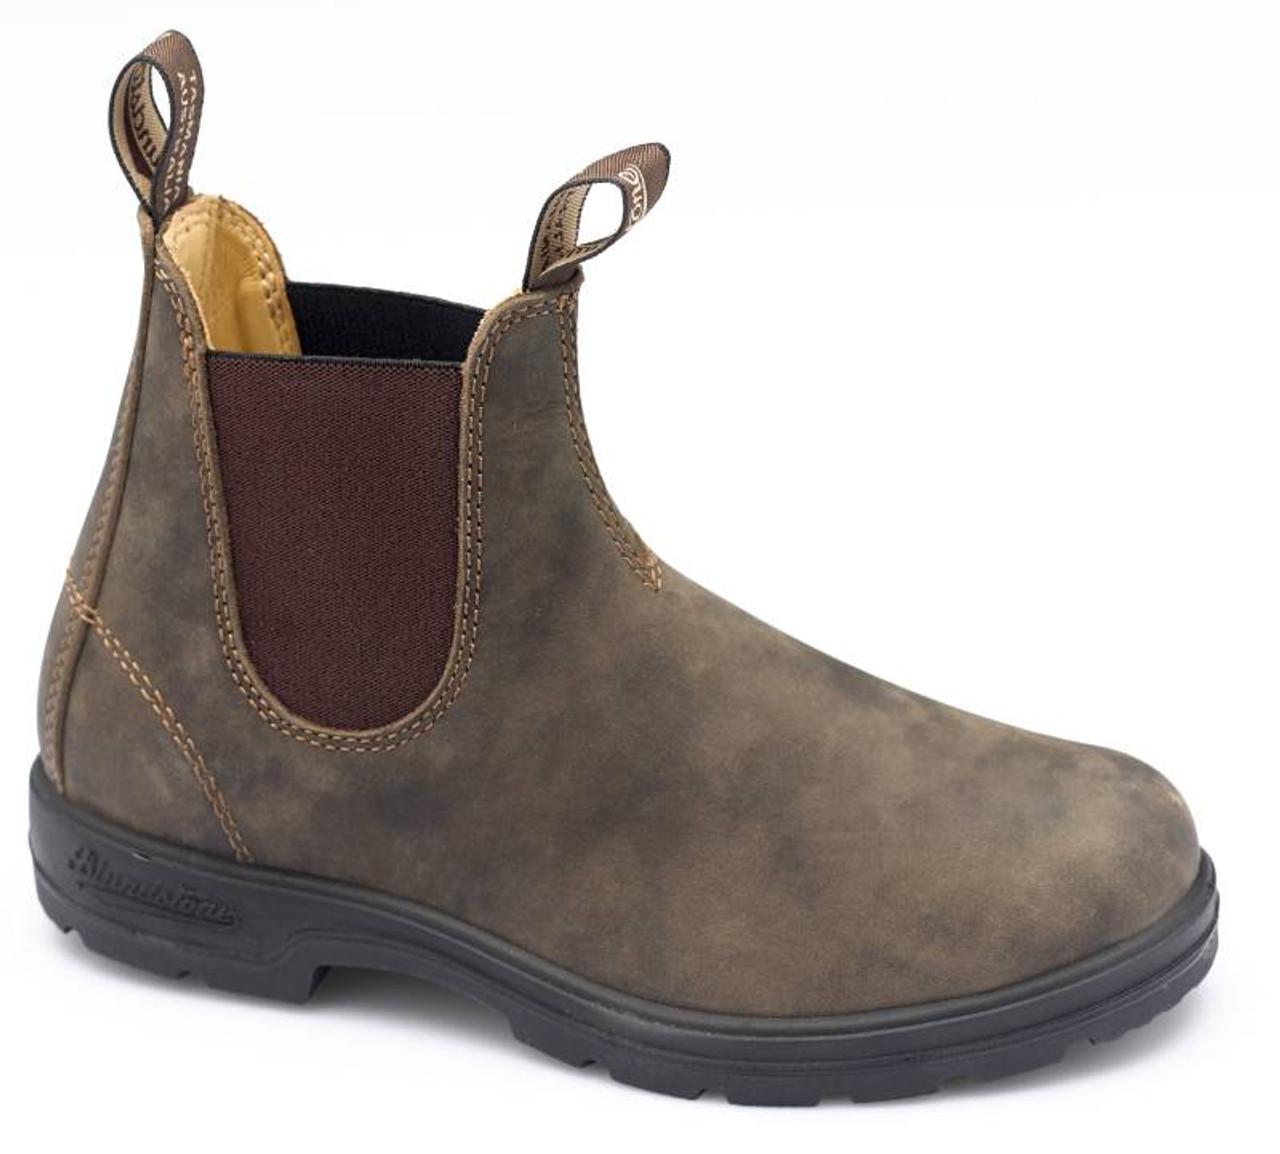 34496dd84f3 Blundstone Urbans 585 Rustic Brown Leather Boots